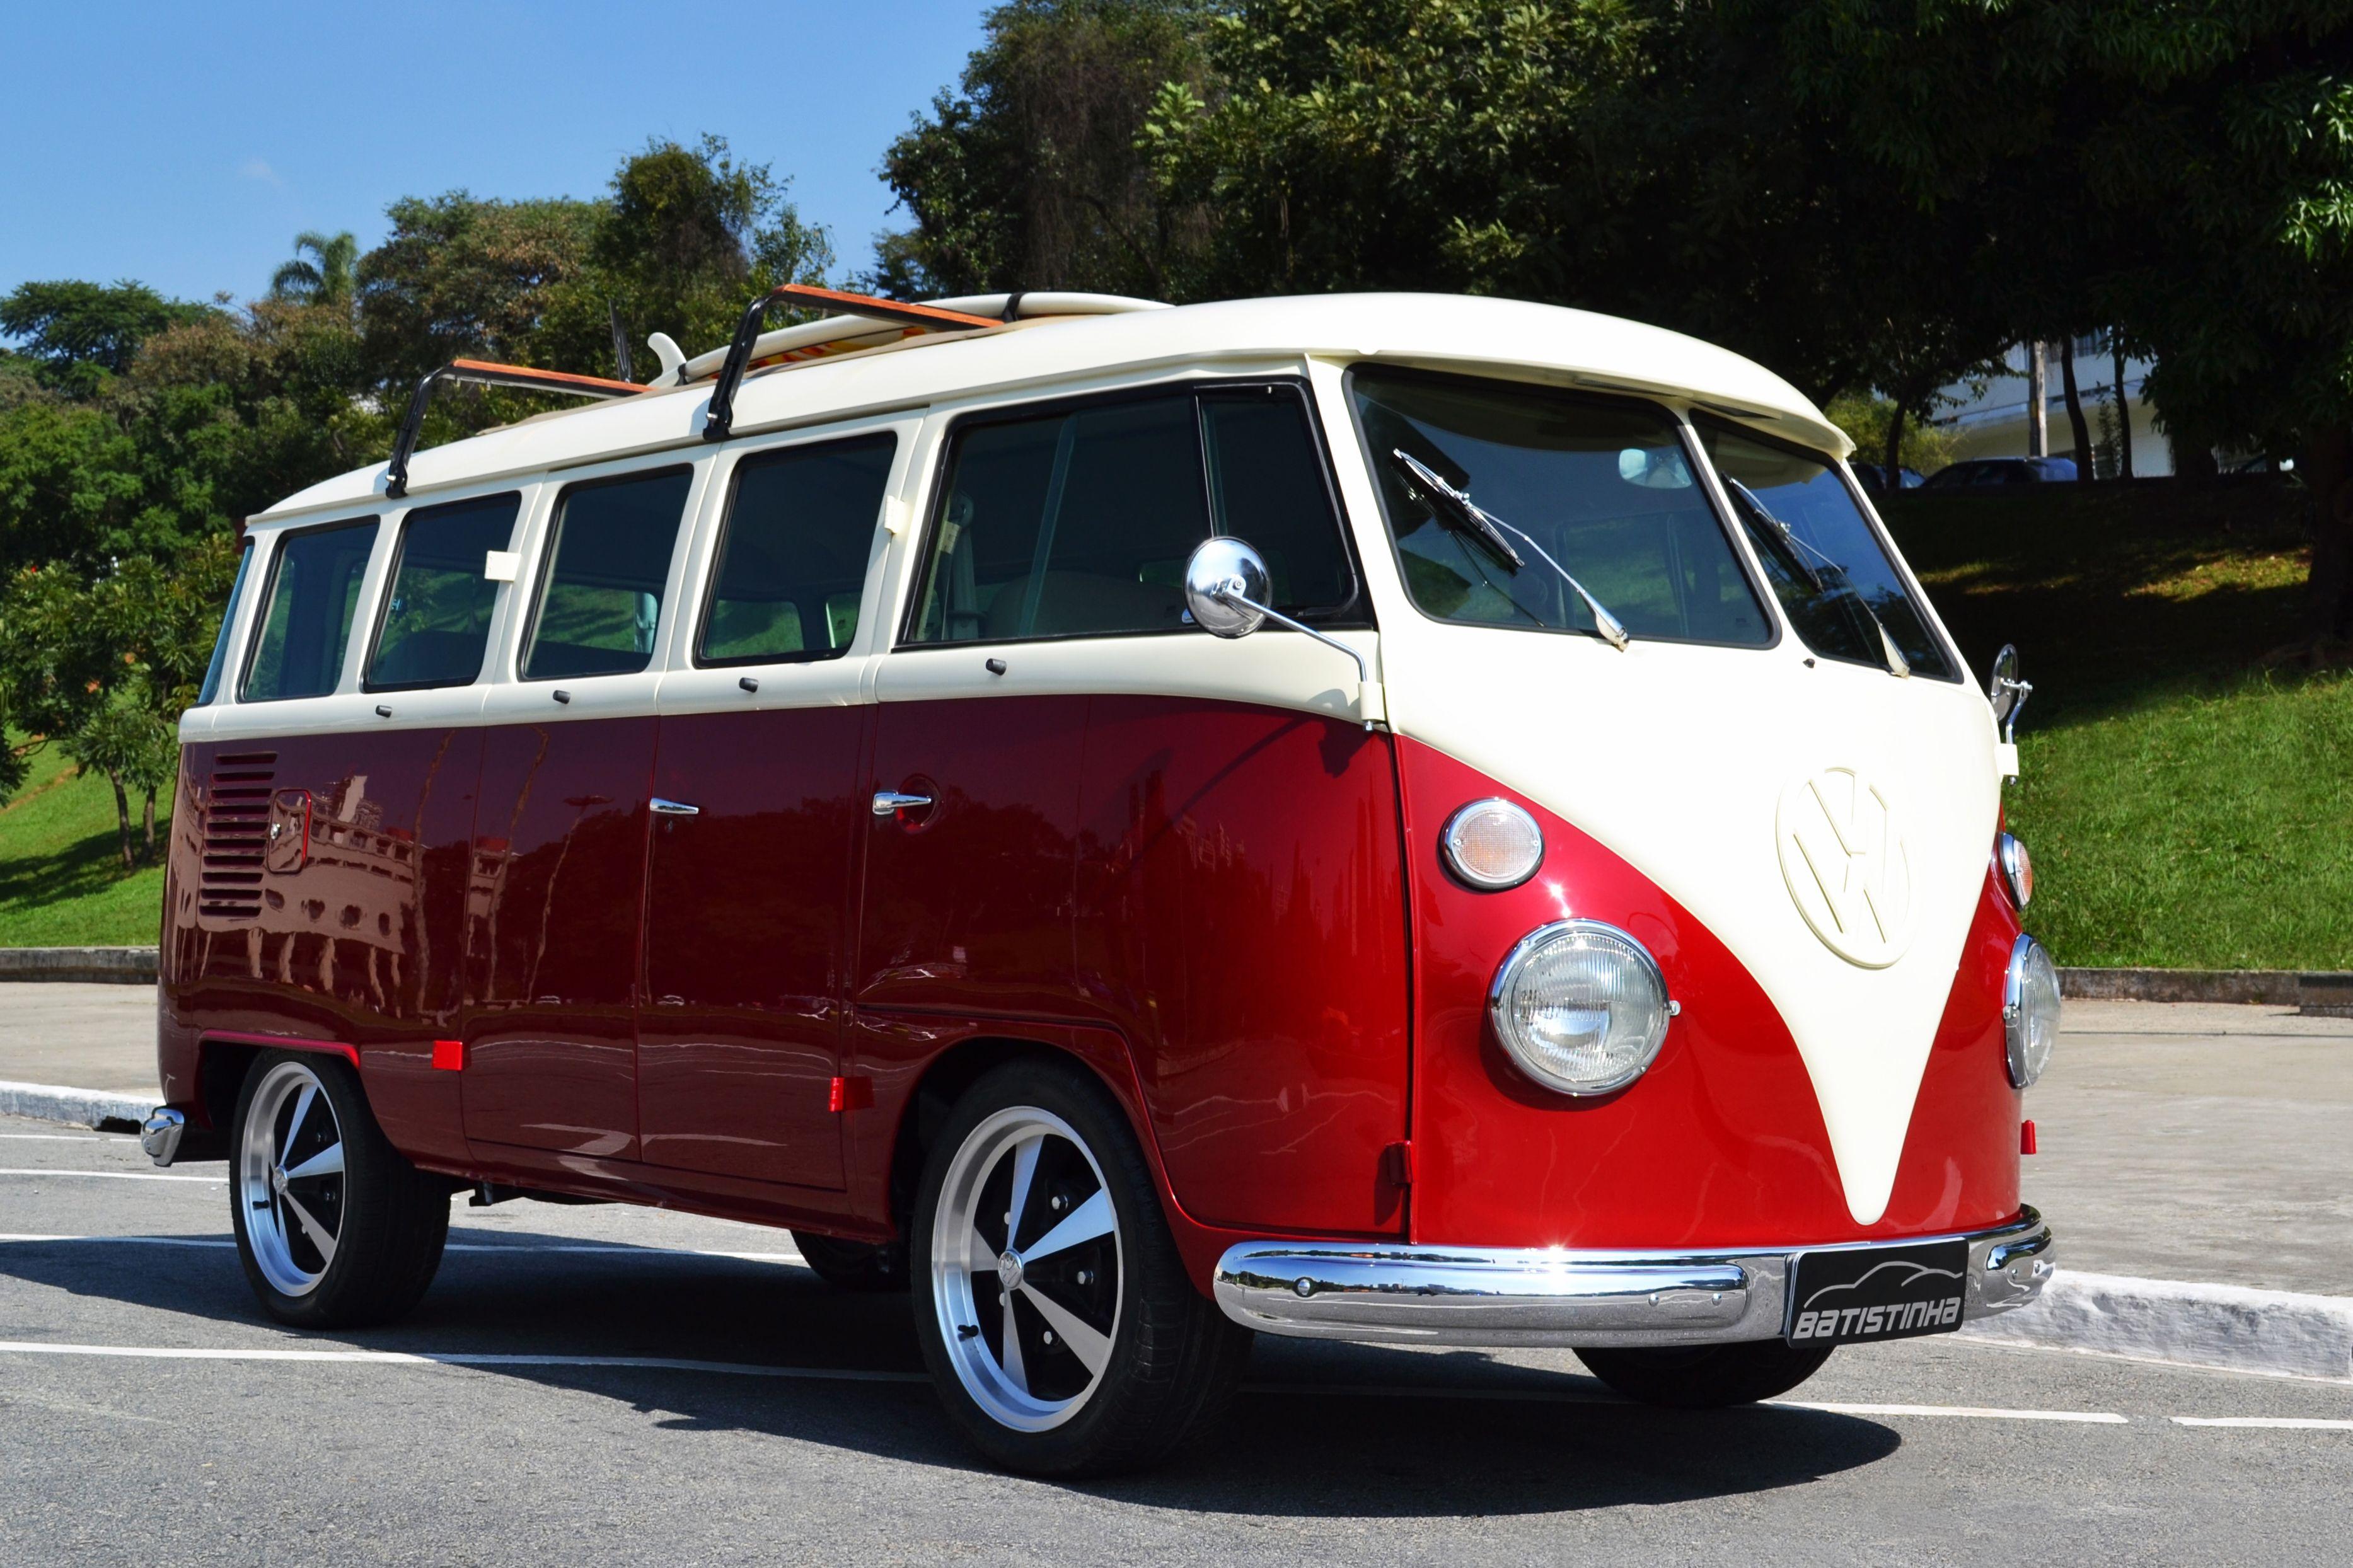 vw kombi california 1965 custom cars pinterest vw. Black Bedroom Furniture Sets. Home Design Ideas